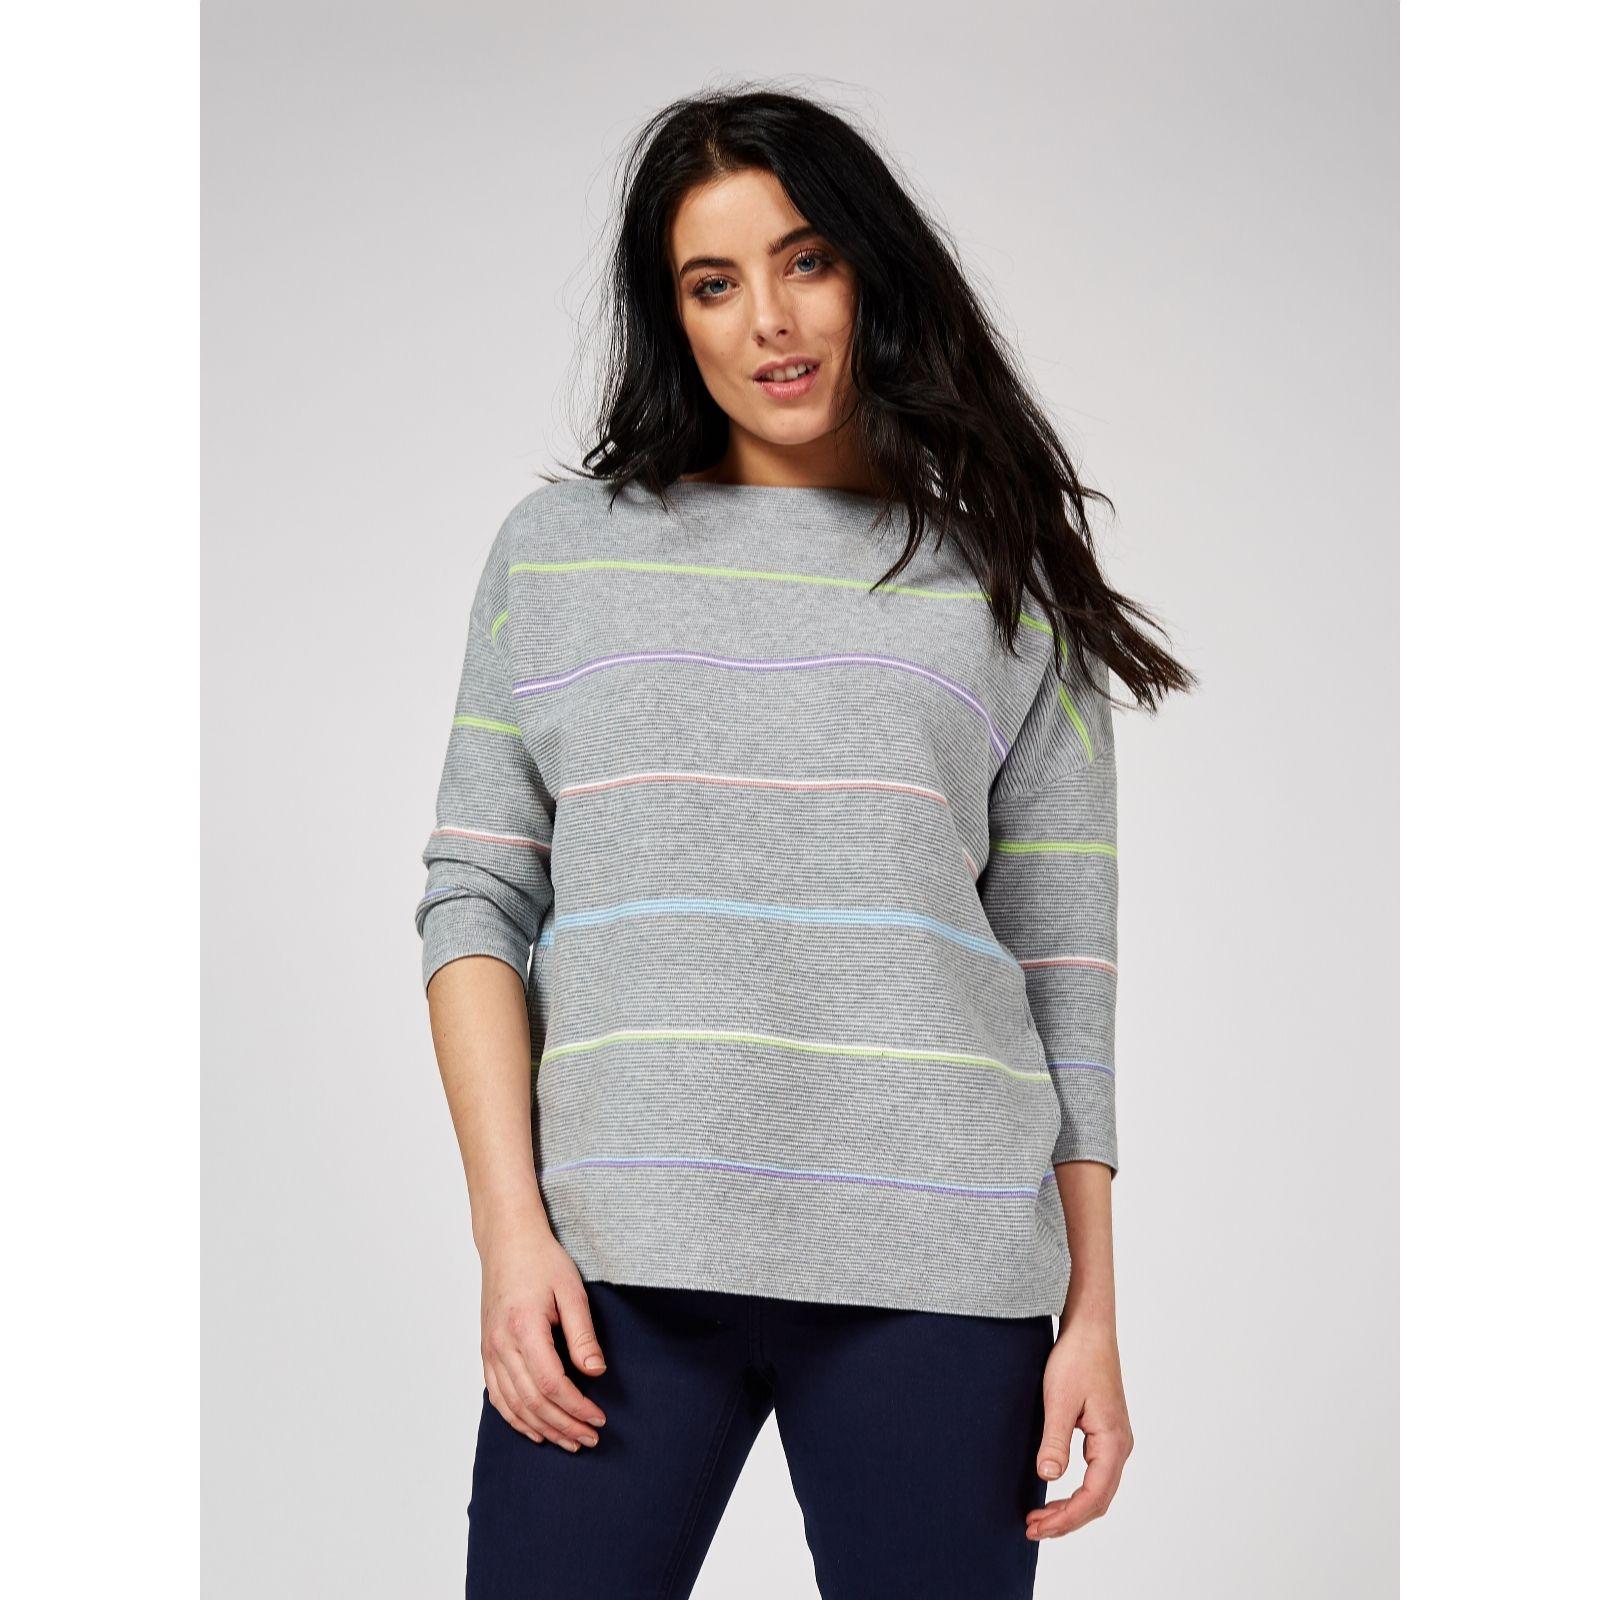 97e057174f6 Phase Eight Piera Rainbow Stripe Knit Jumper - QVC UK